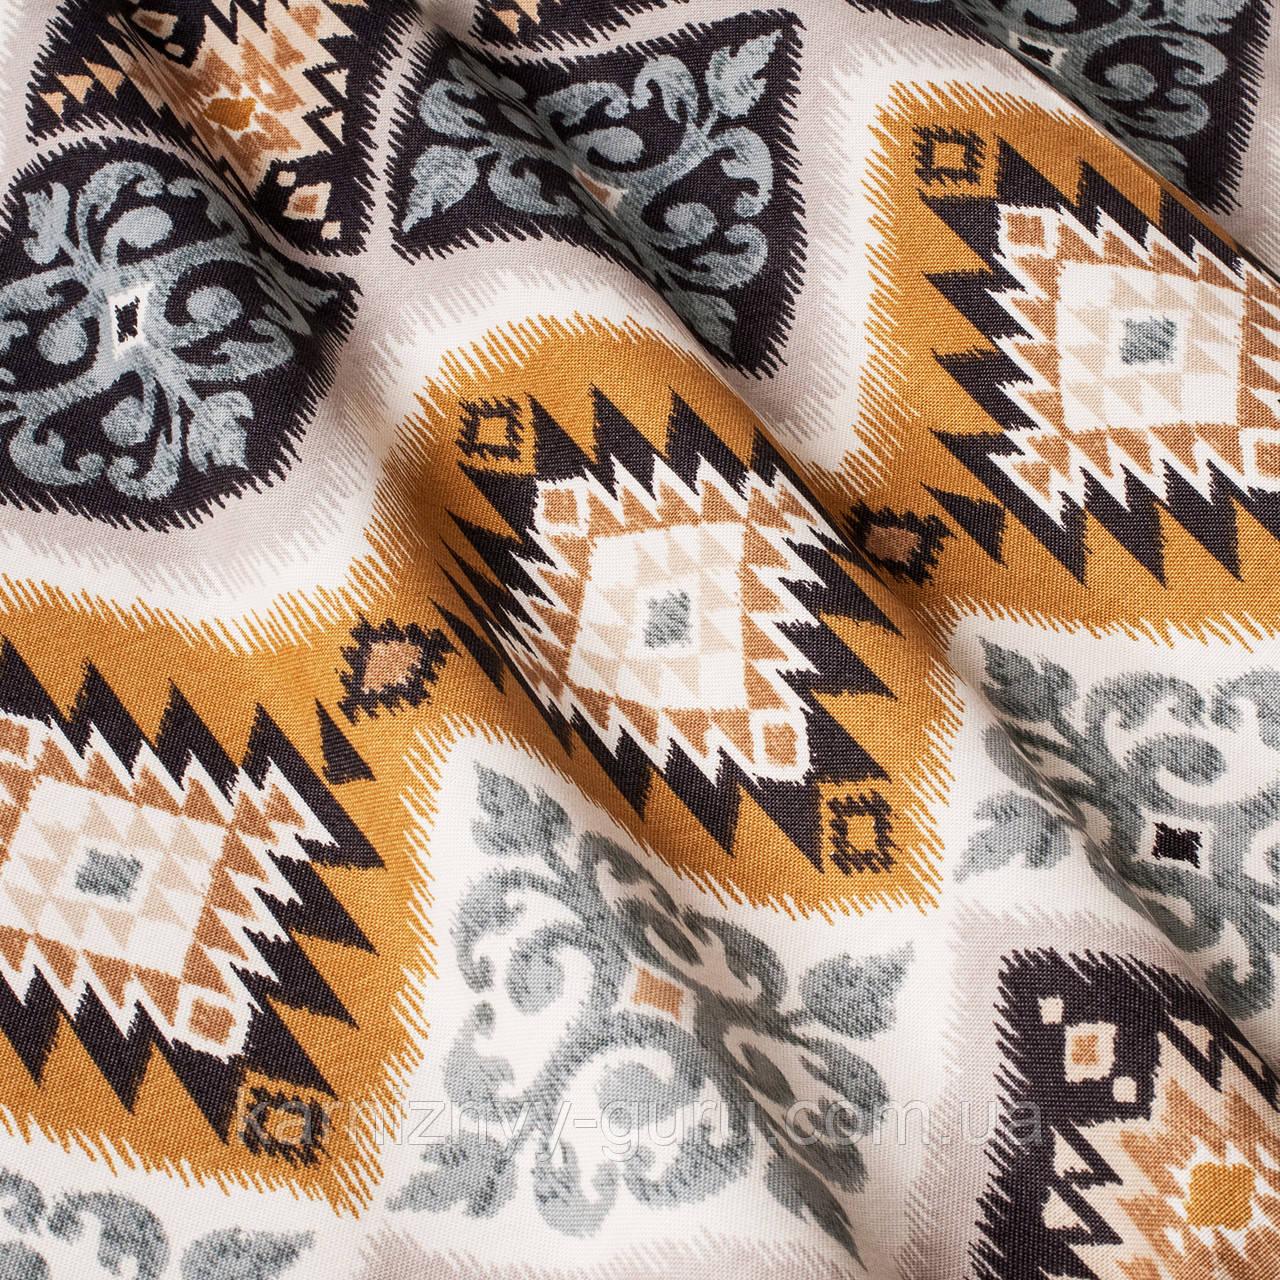 Декоративная ткань пэчворк желтого и бежевого цвета Турция 84493v1